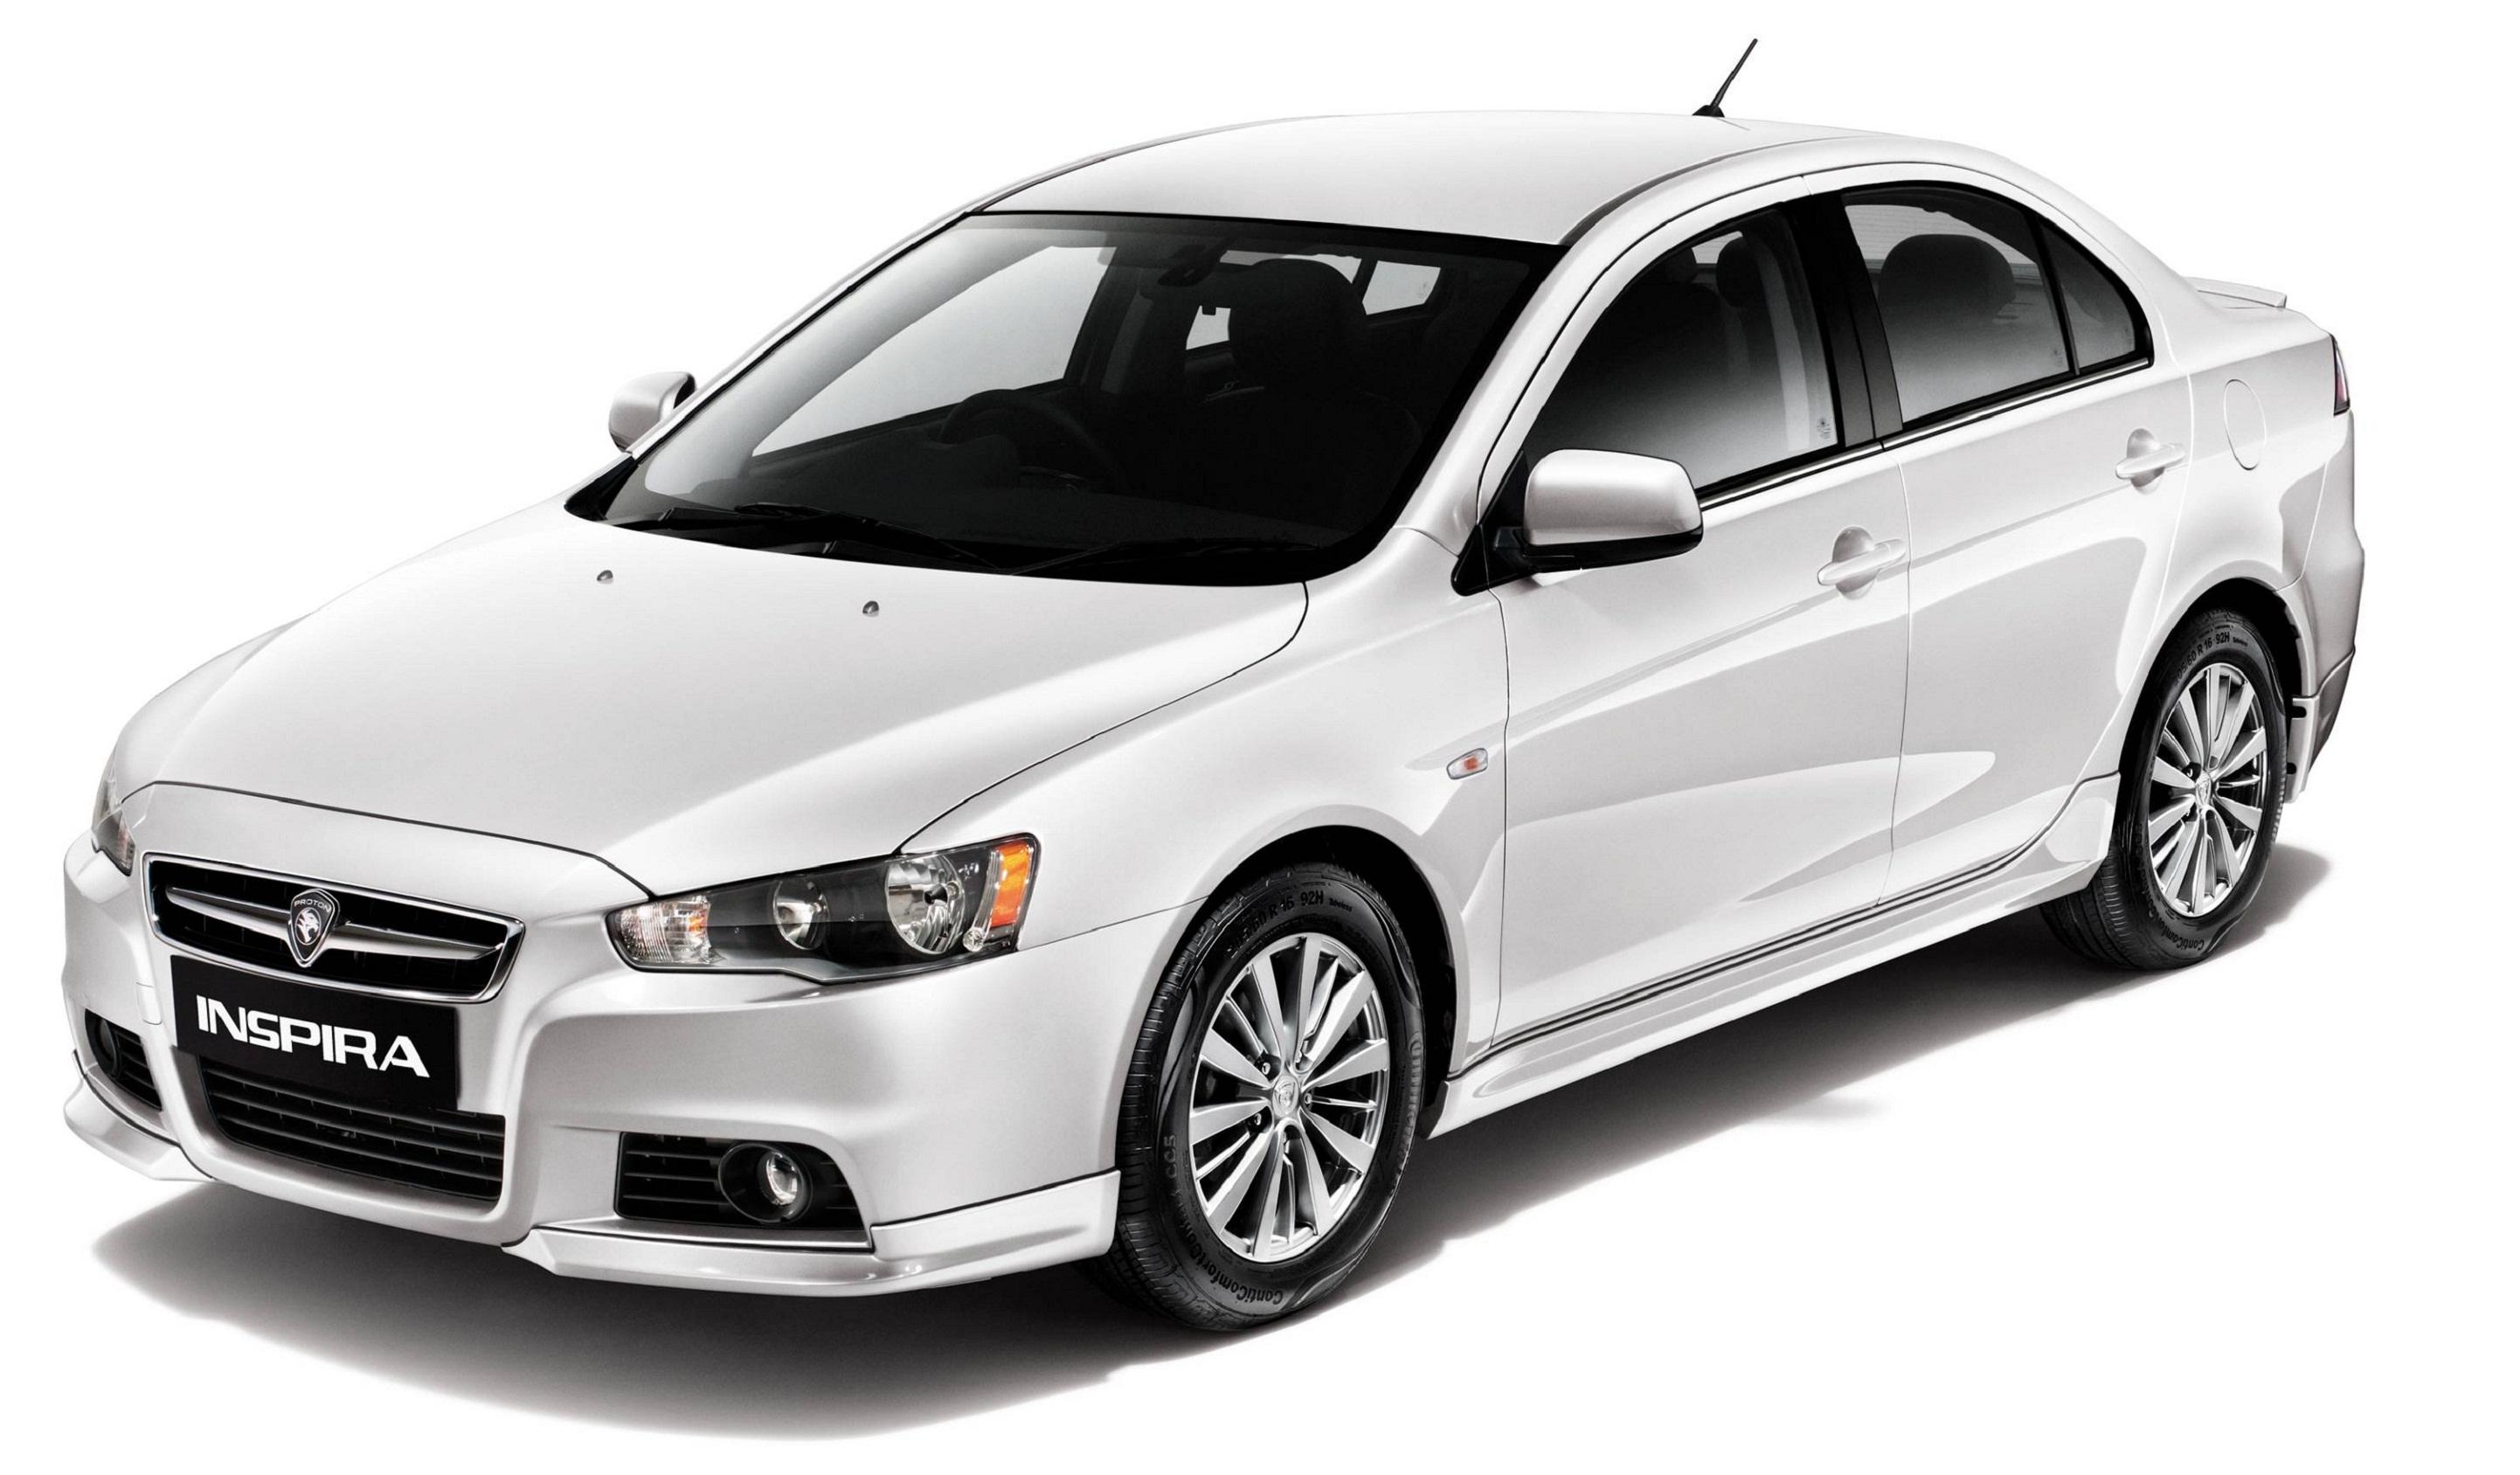 proton inspira 2012 year end promotion my best car dealer